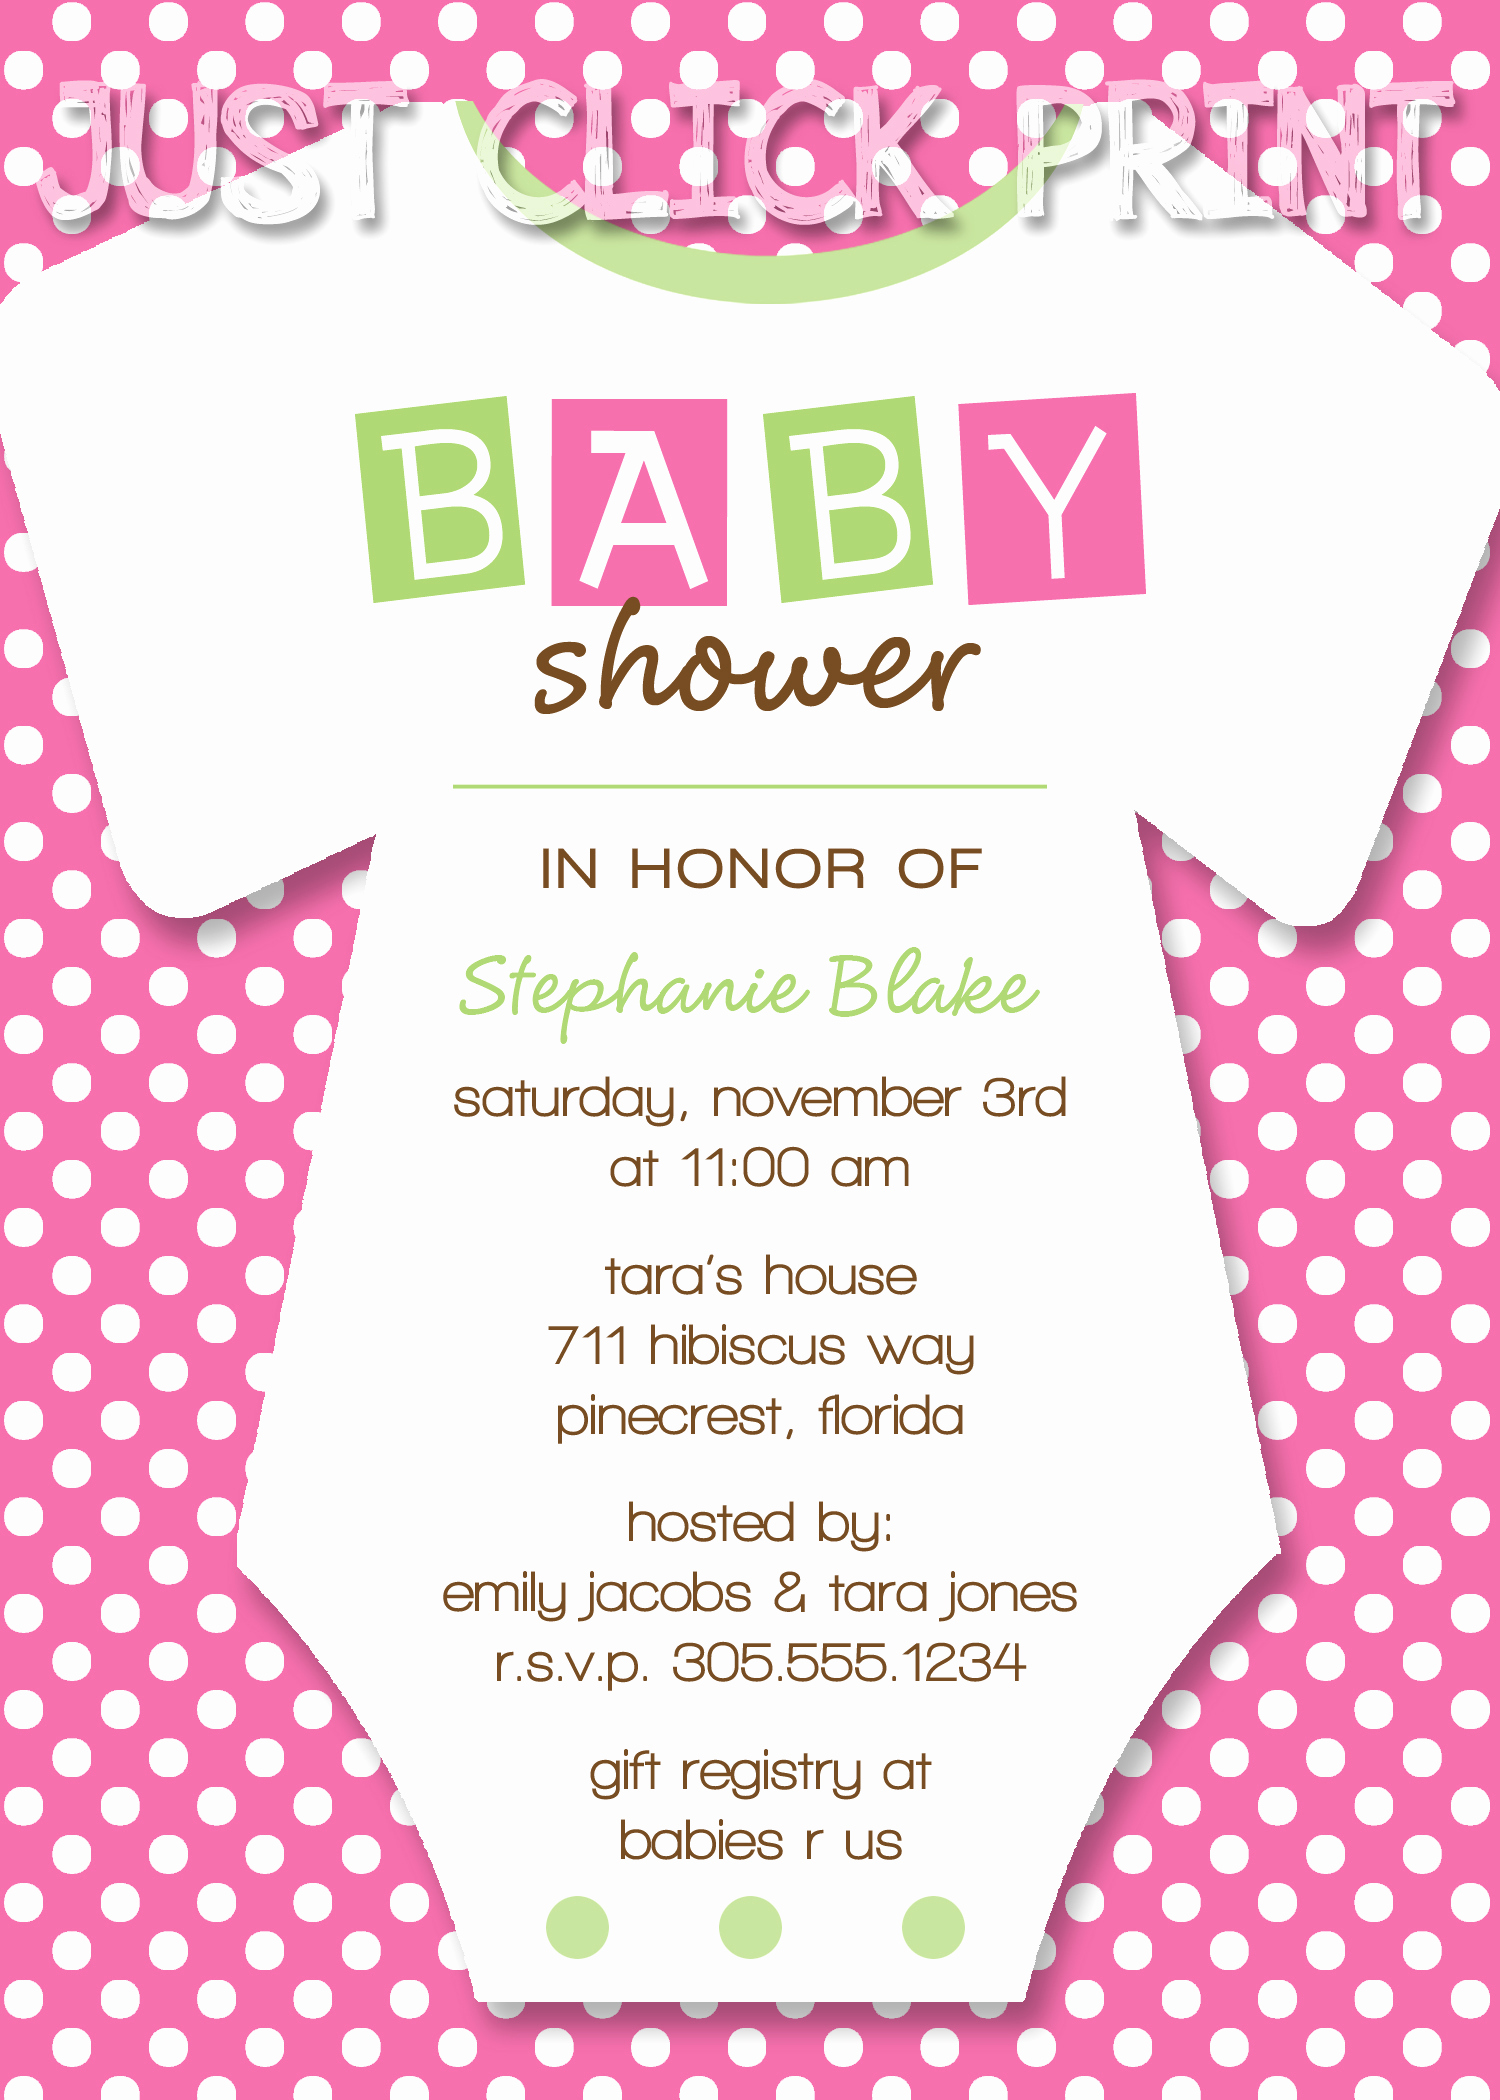 Baby Shower Invitation Printable Beautiful Esies Baby Shower Invitation Printable Any Color · Just